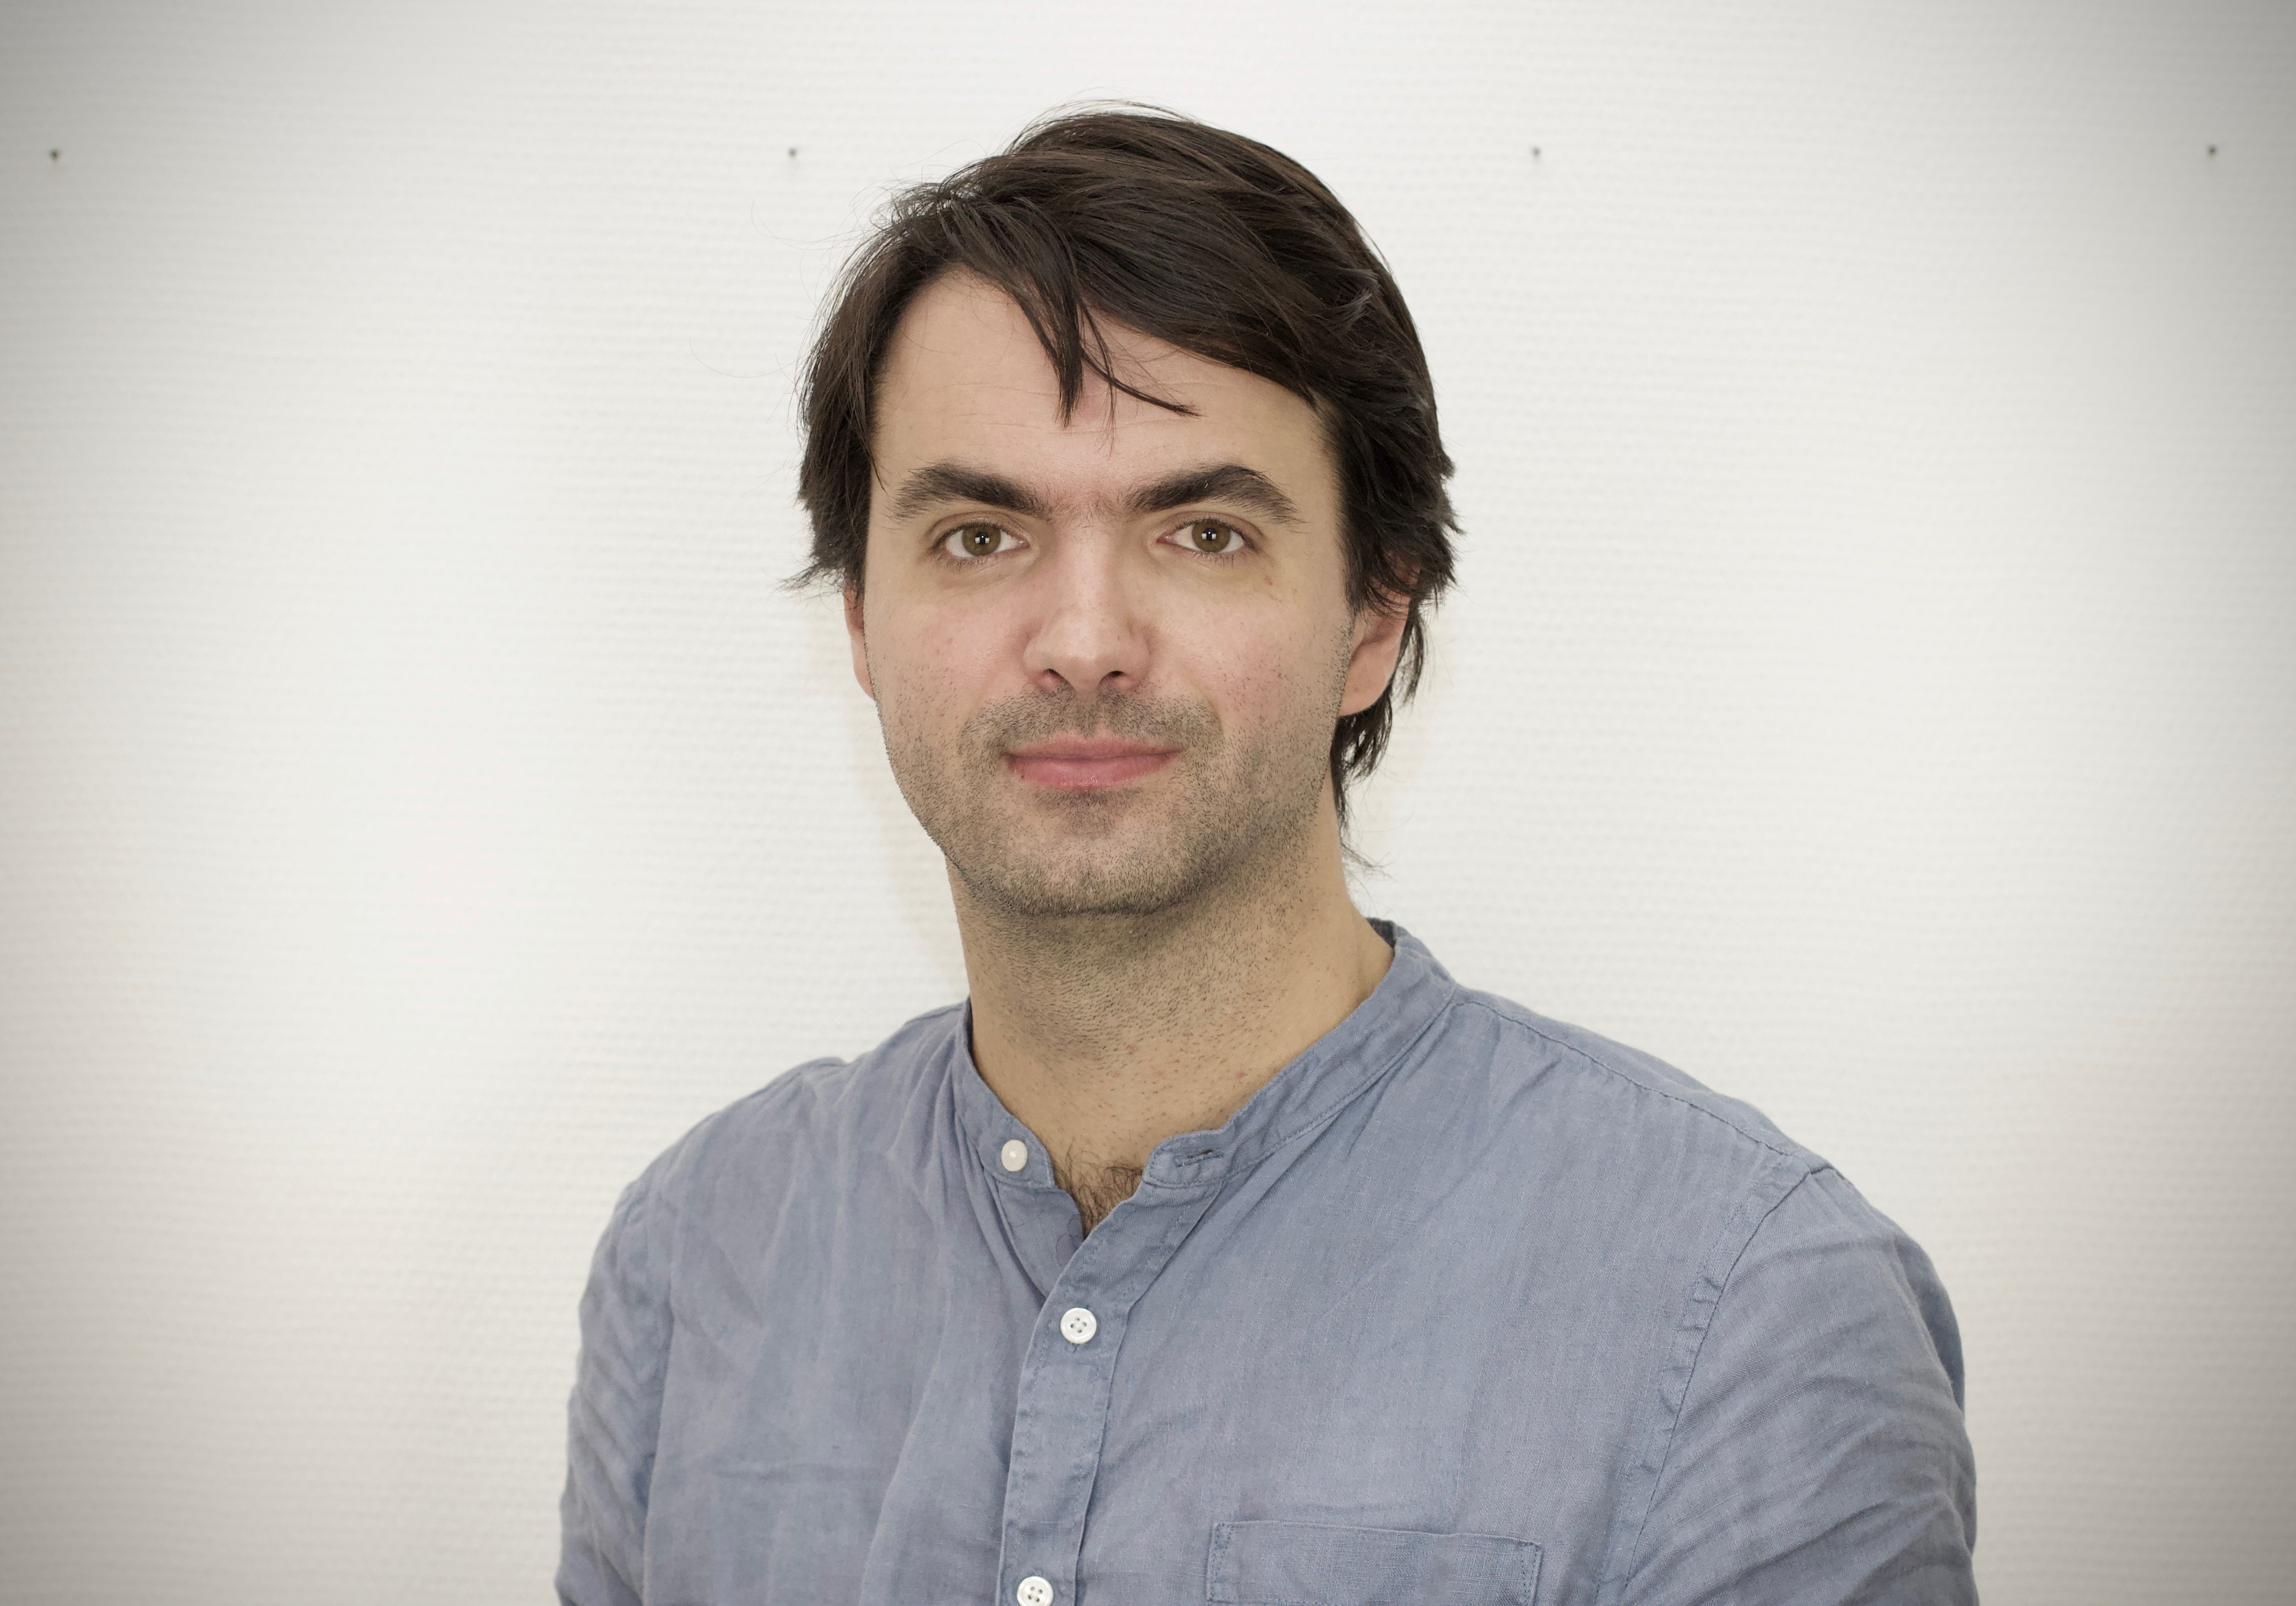 Christian Katzenbach